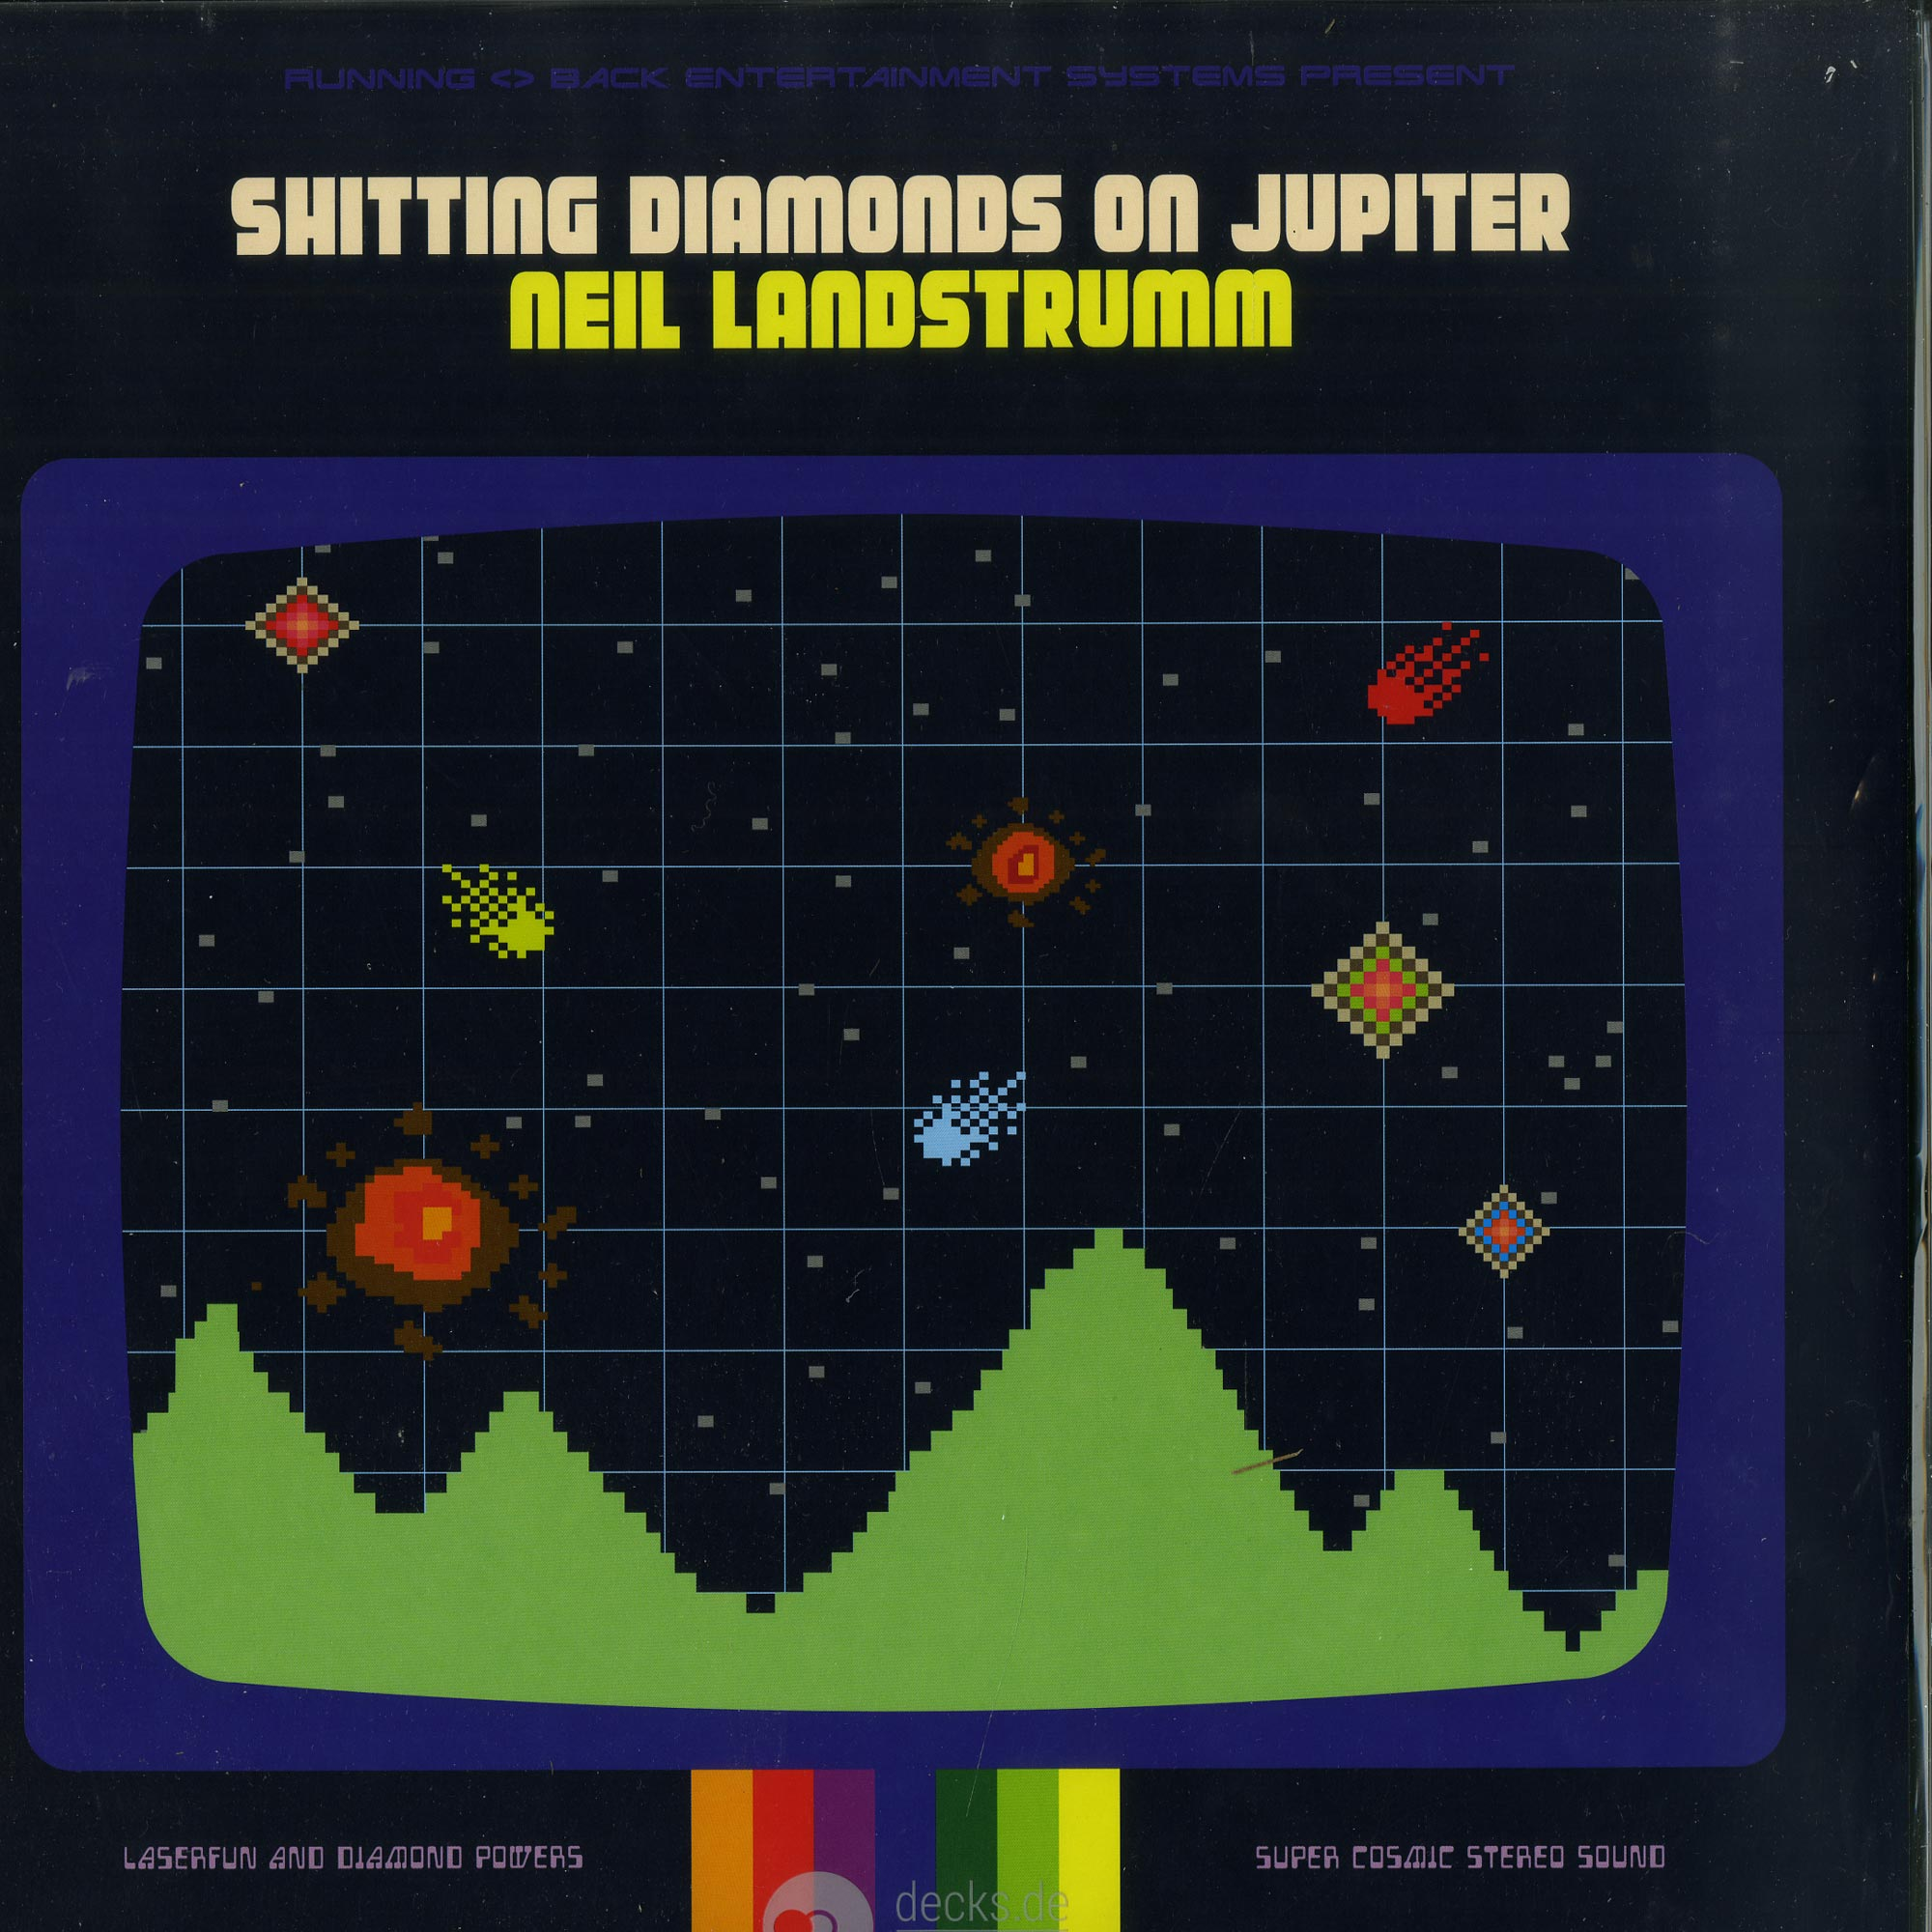 Neil Landstrumm - SHITTING DIAMONDS ON JUPITER